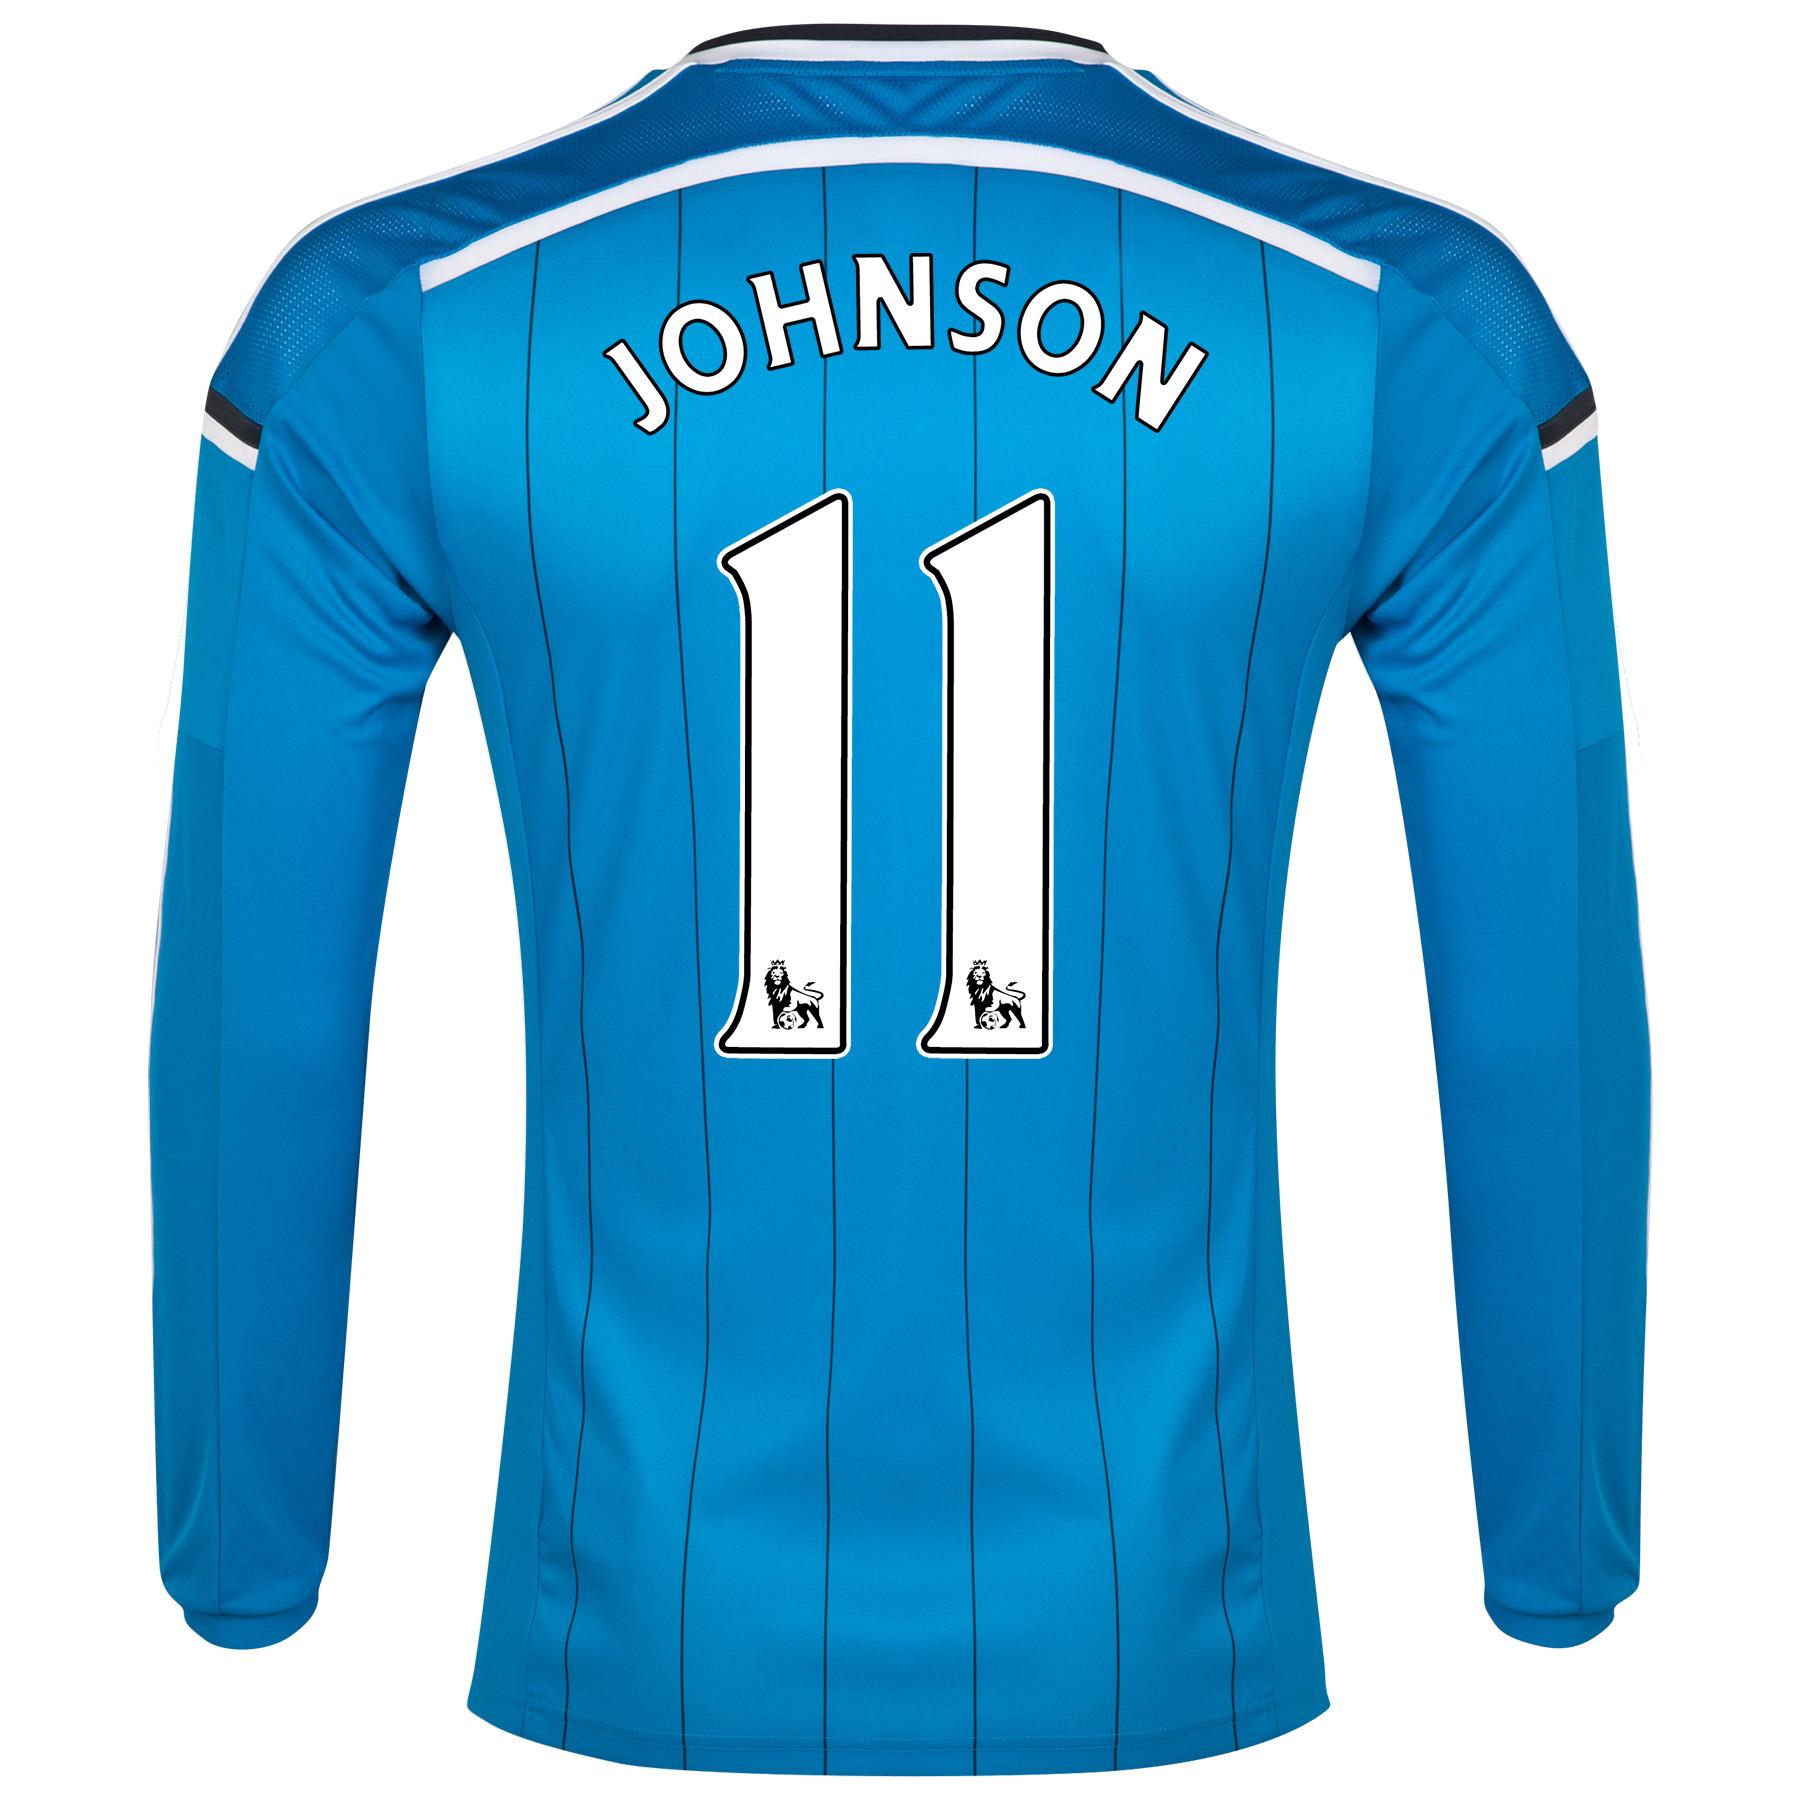 Sunderland Away Shirt 2014/15 - Long Sleeved Lt Blue with Johnson 11 printing